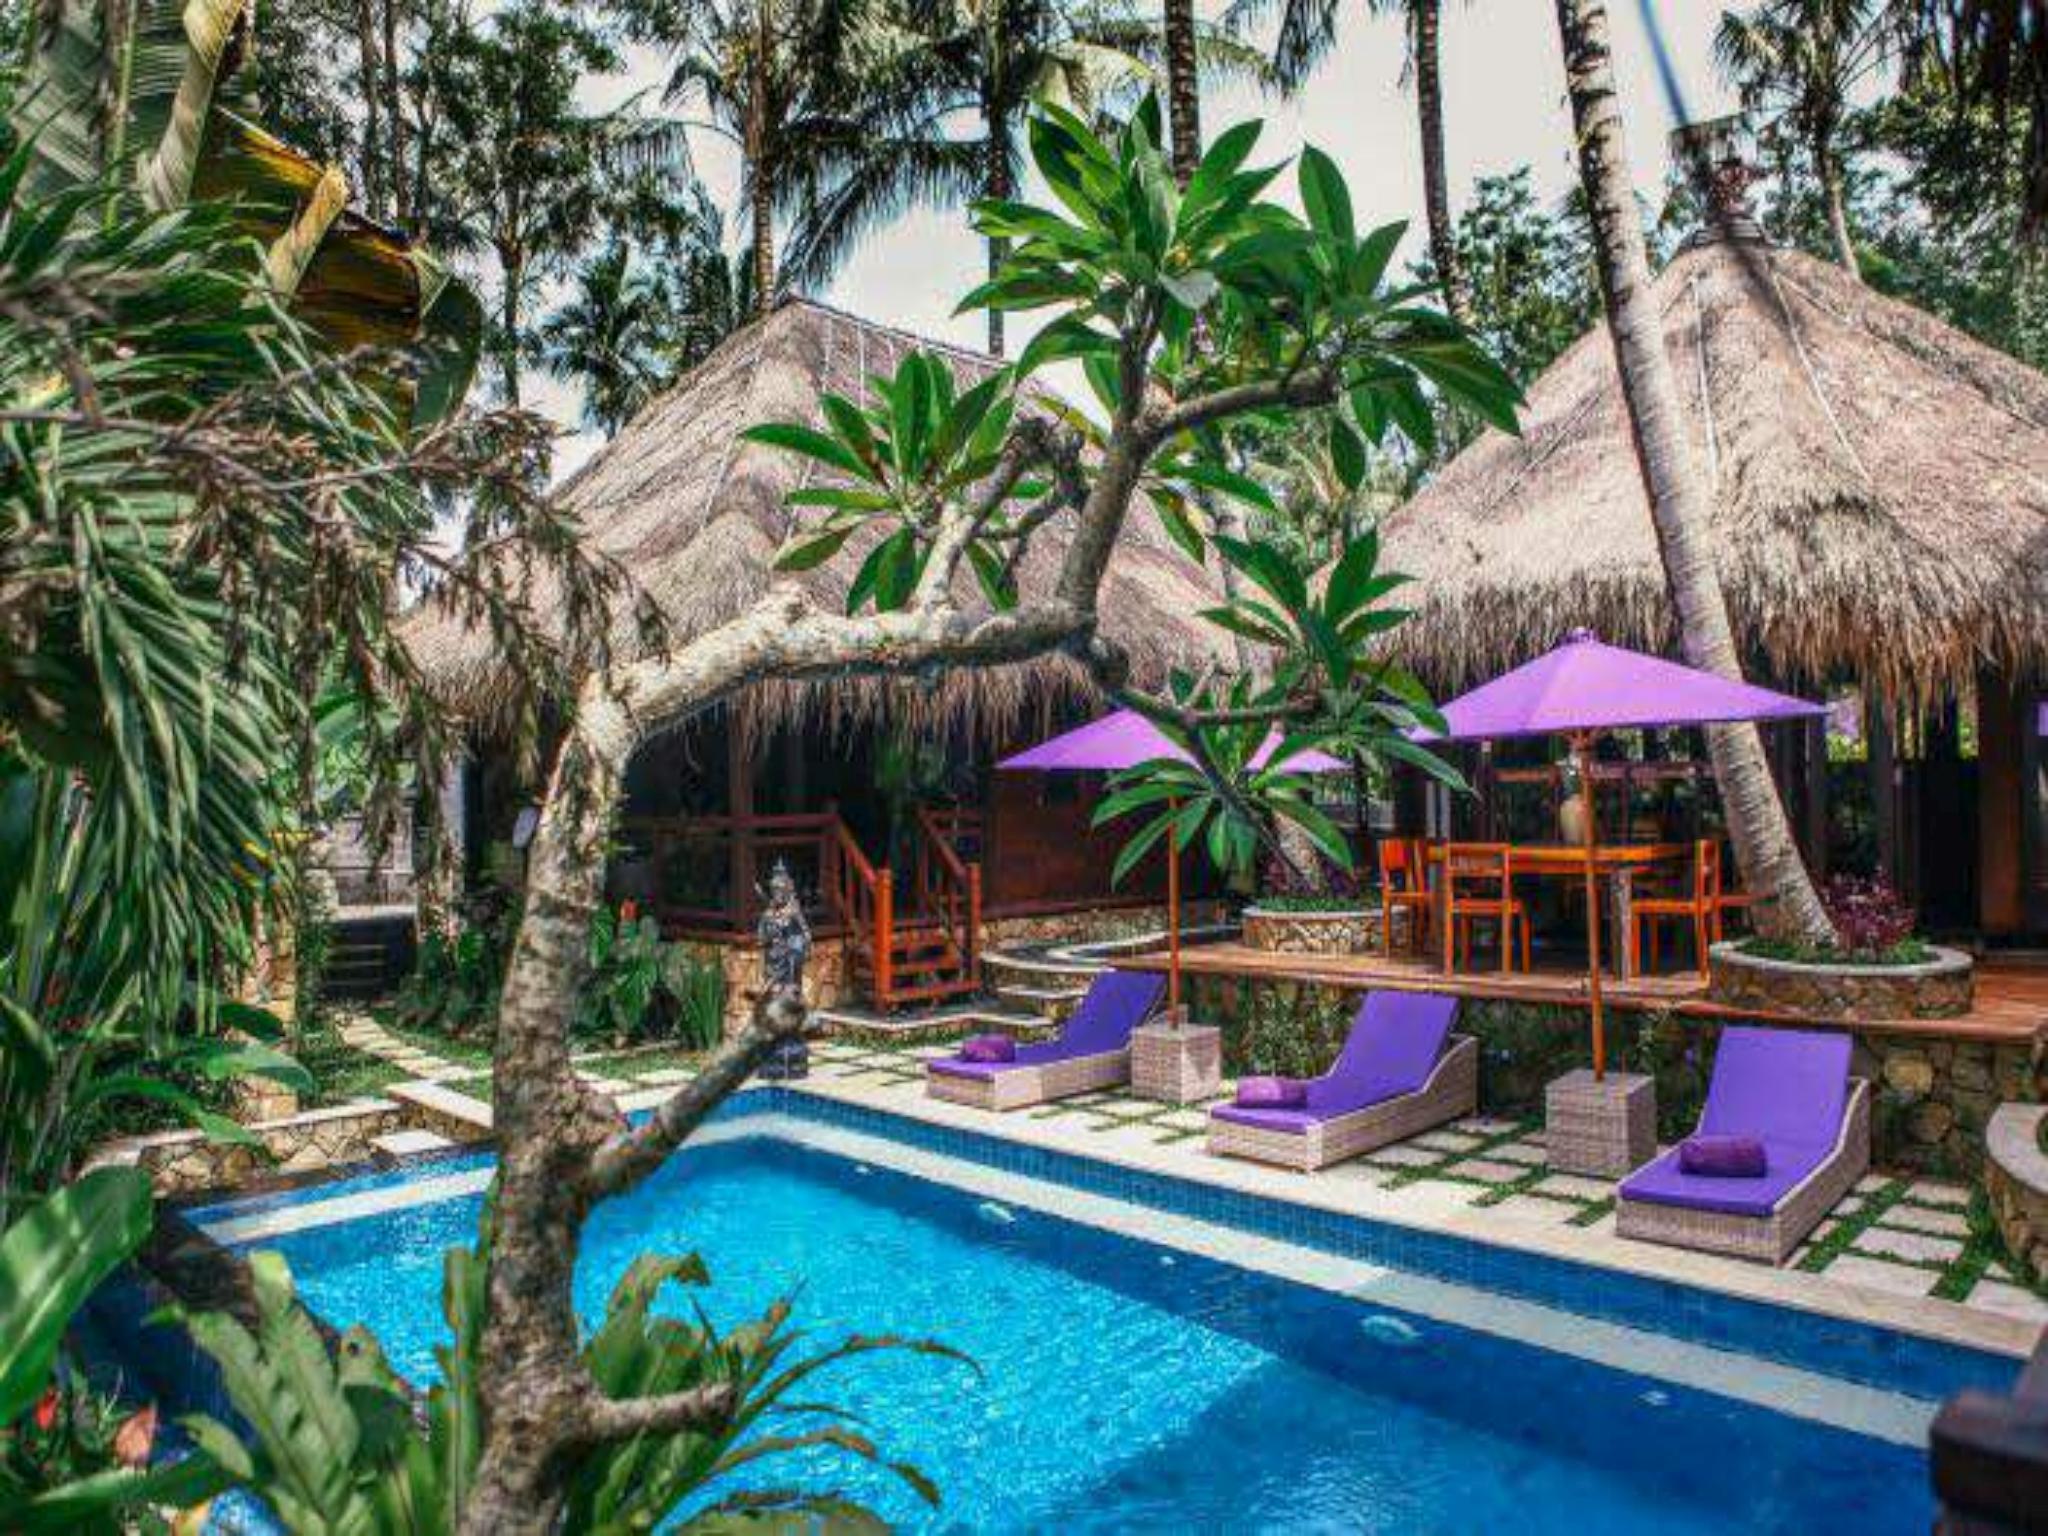 Bali Village Private Villa 1 Bedroom